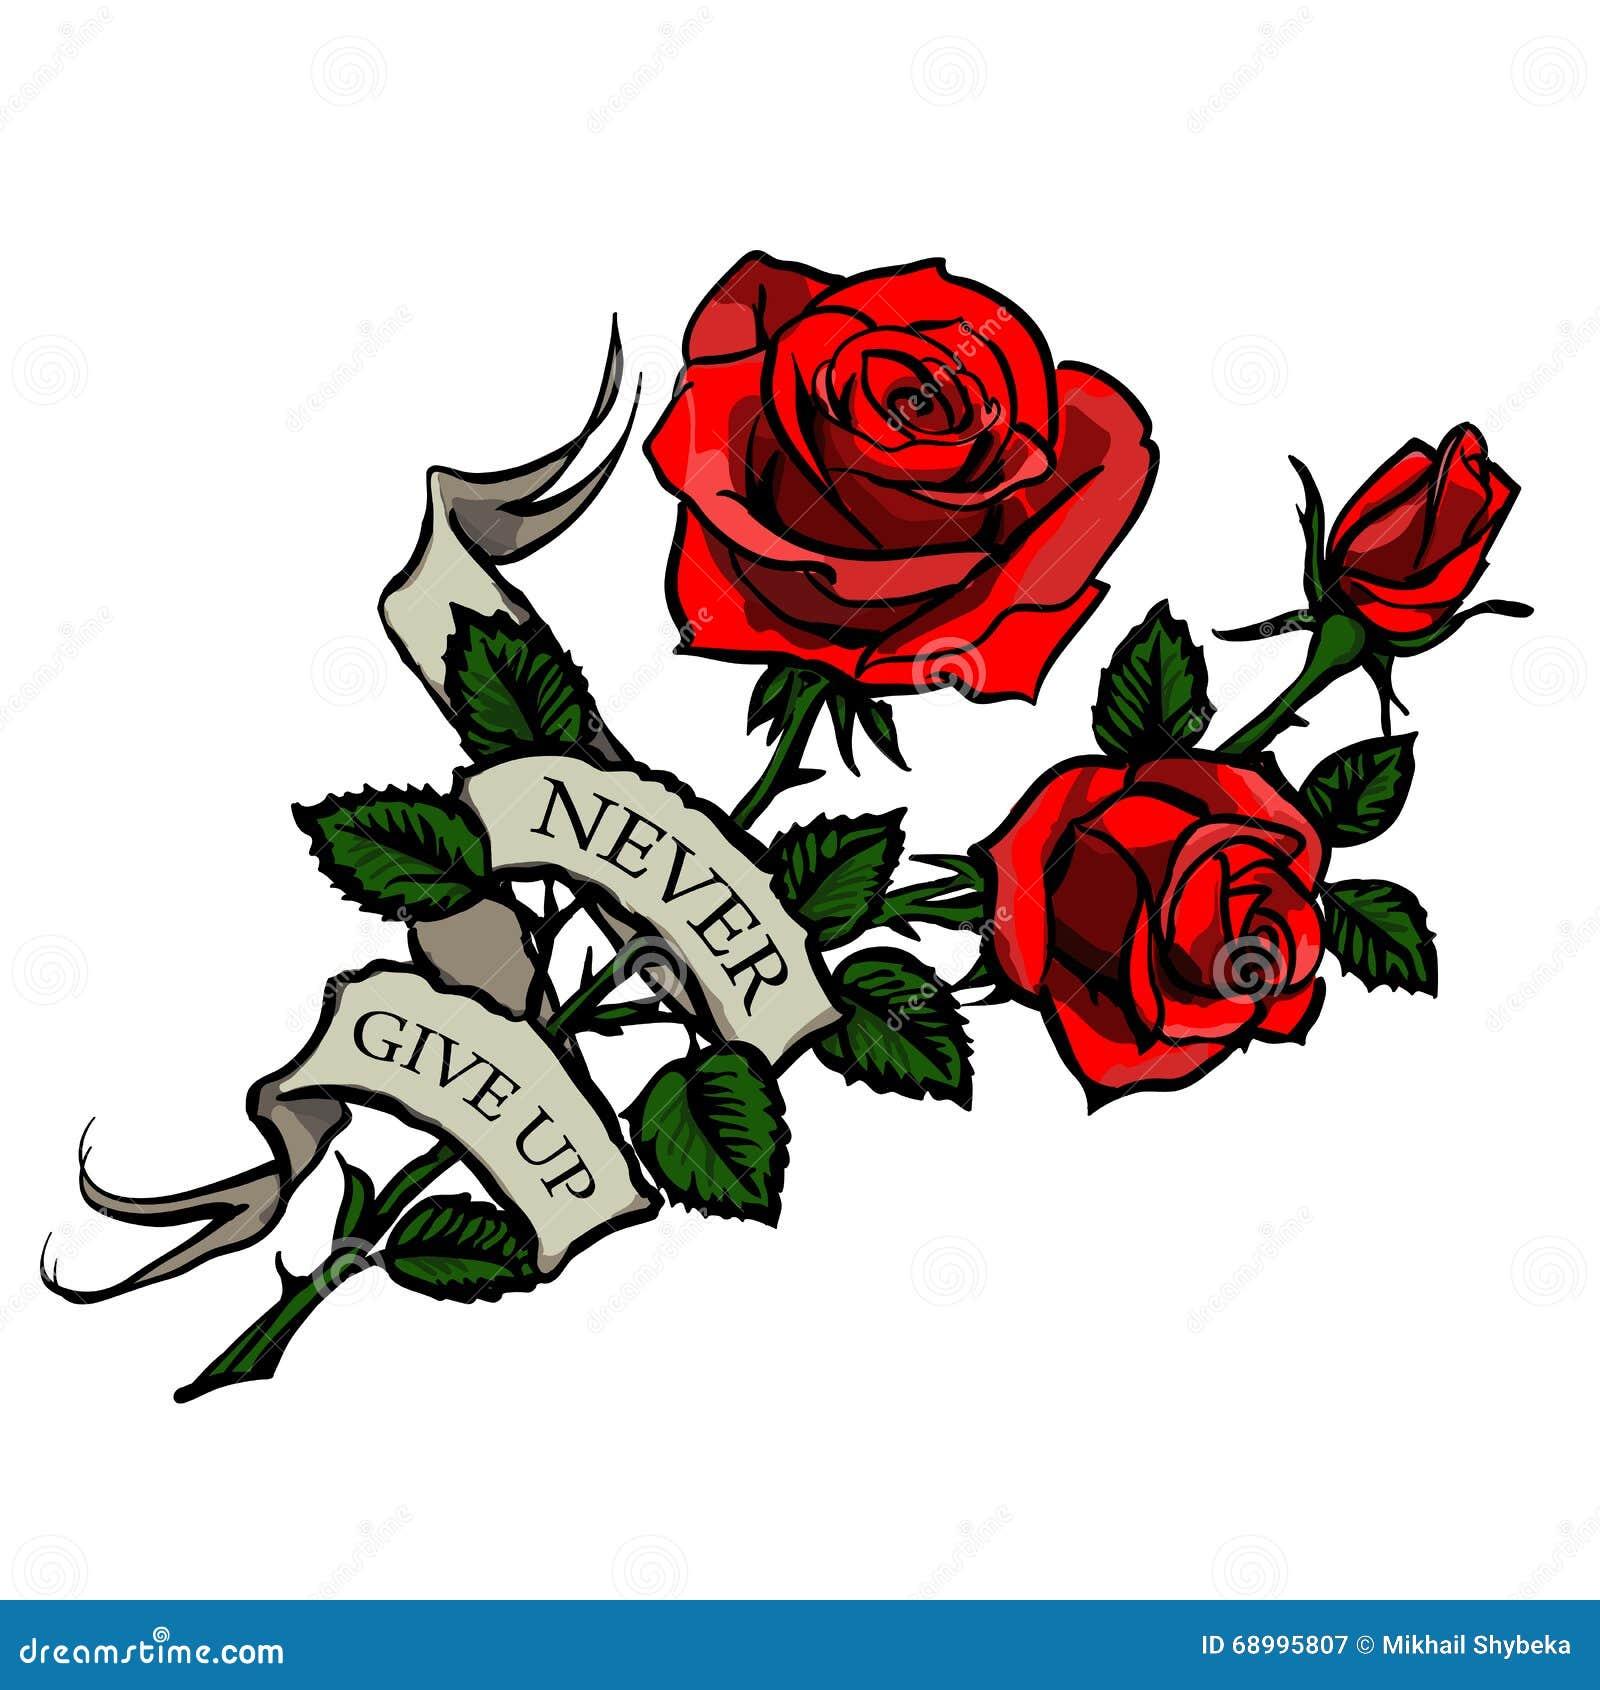 Ilustrao Stock Rosas Vermelhas Da Tatuagem Do Vetor Image68995807 on Tumblr Transparent Flowers Rose